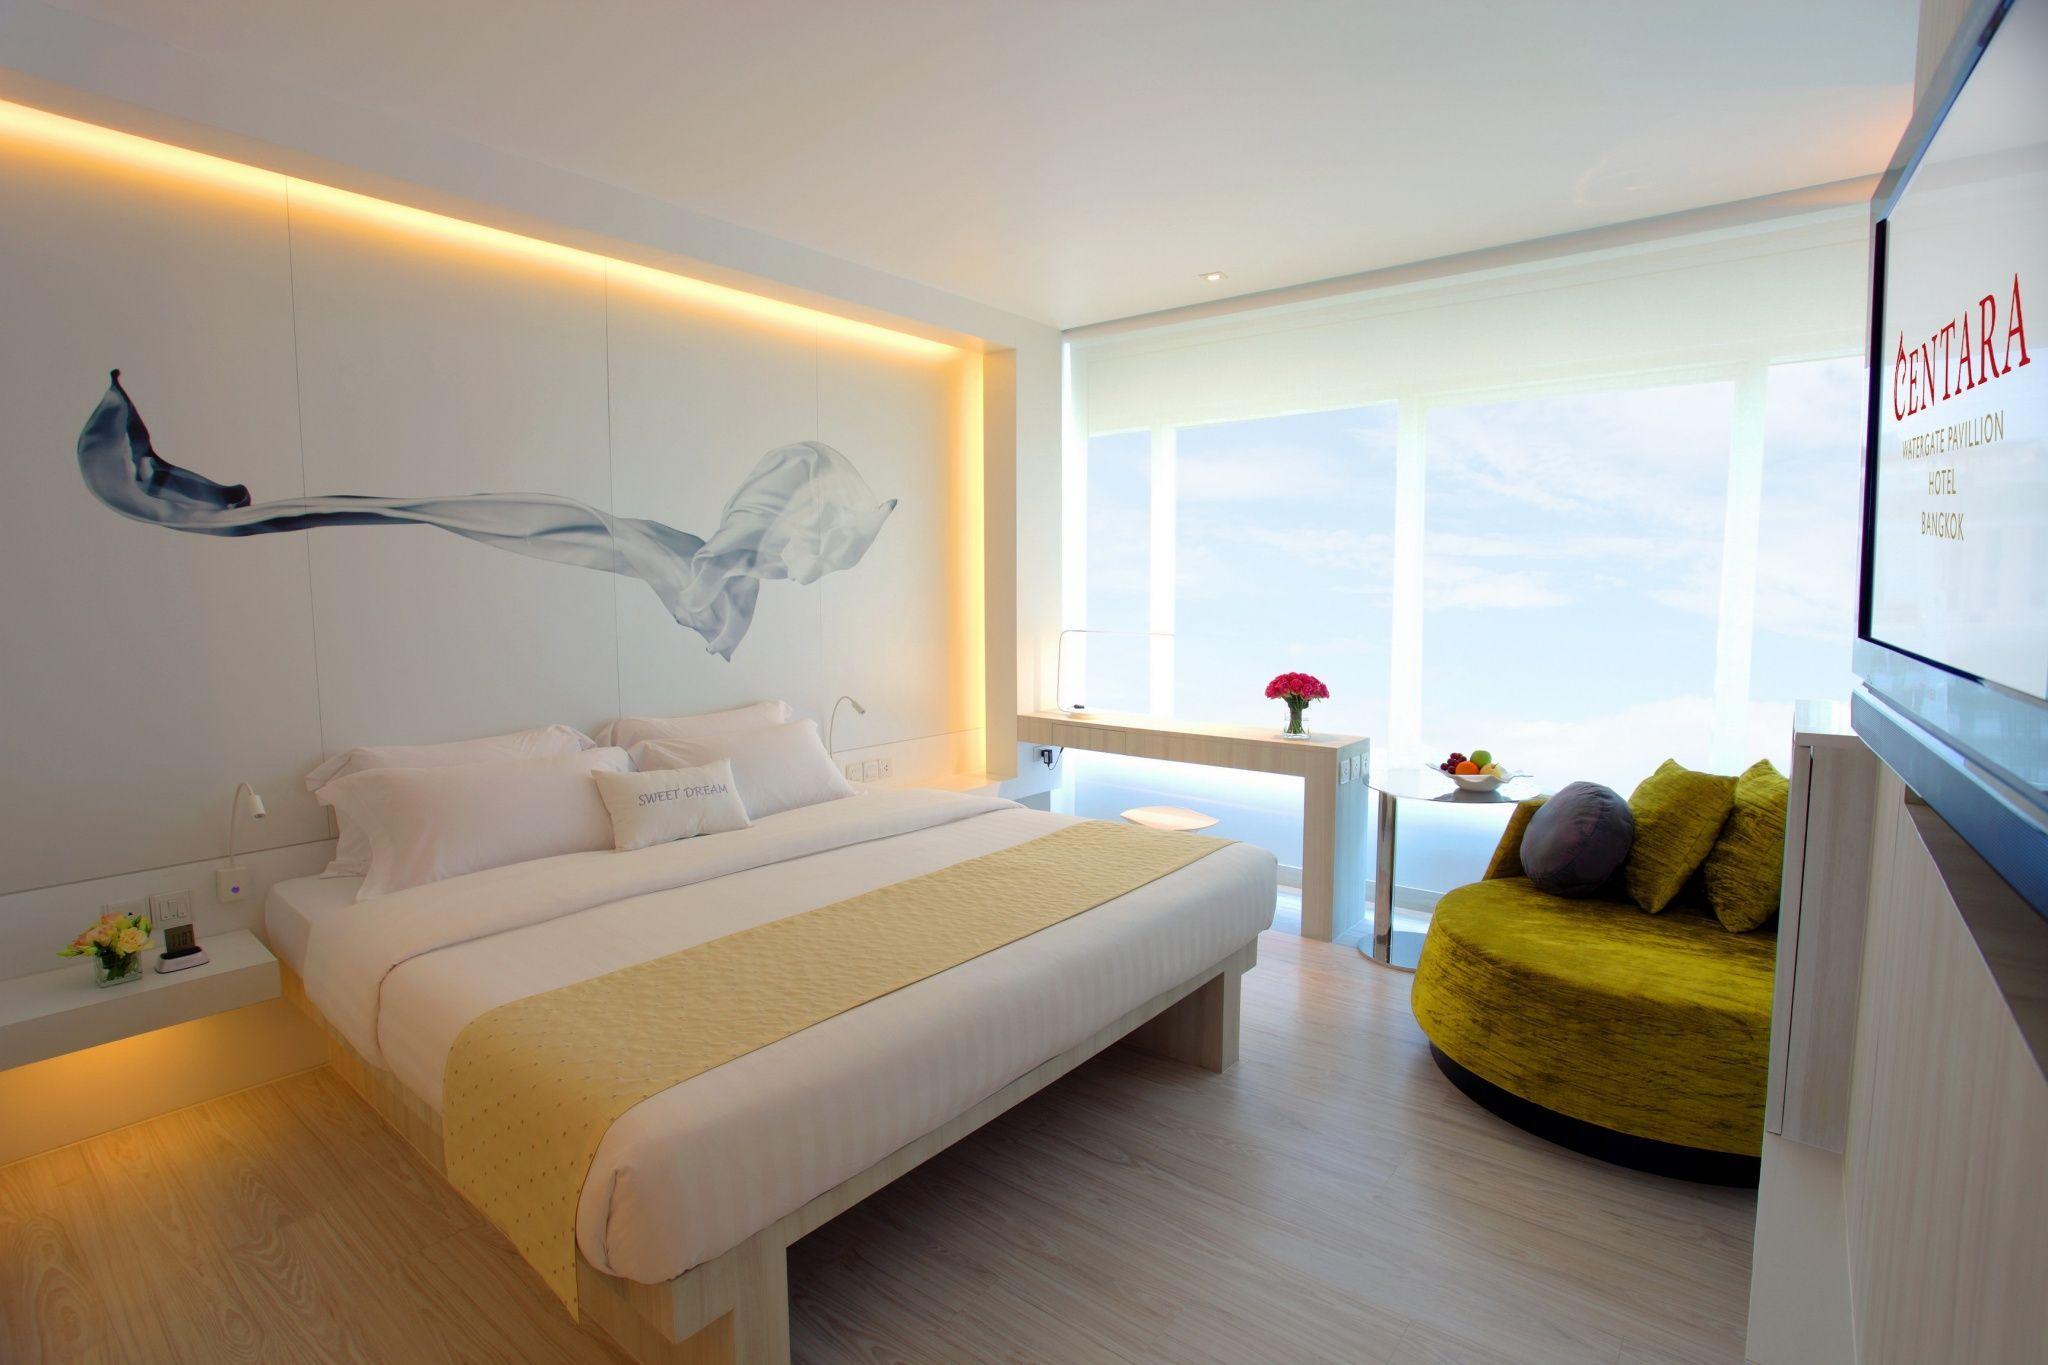 هتل سنتارا واتر گیت پاویلیون بانکوک